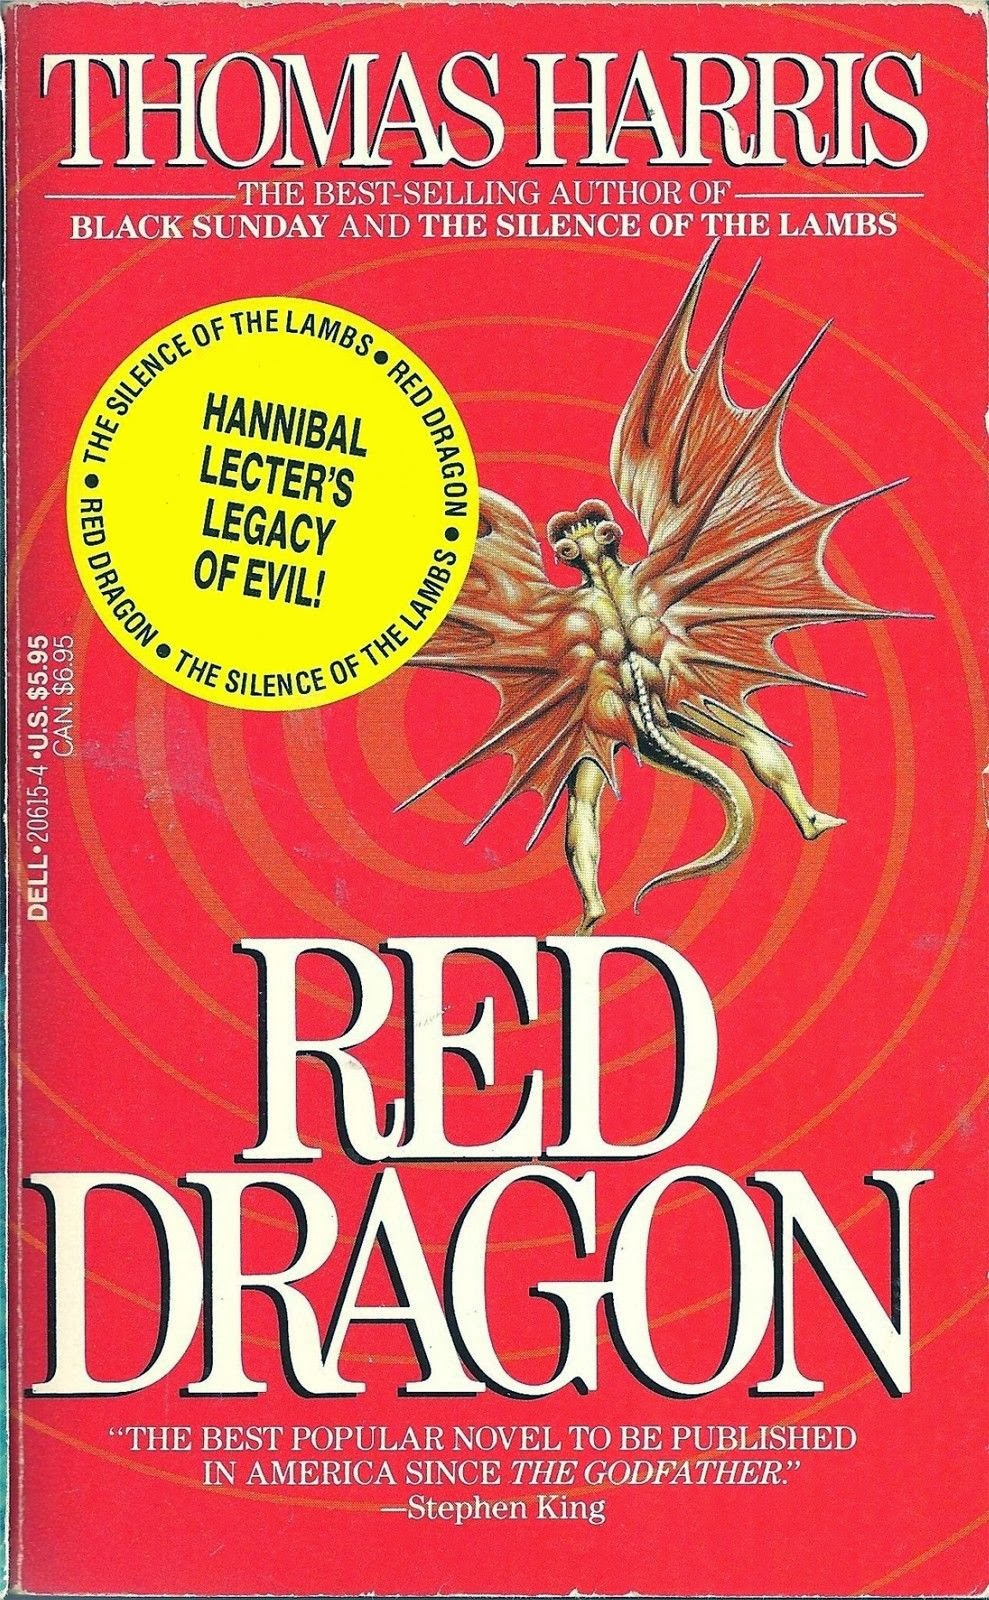 Red Dragon 1990s reprint Thomas Harris